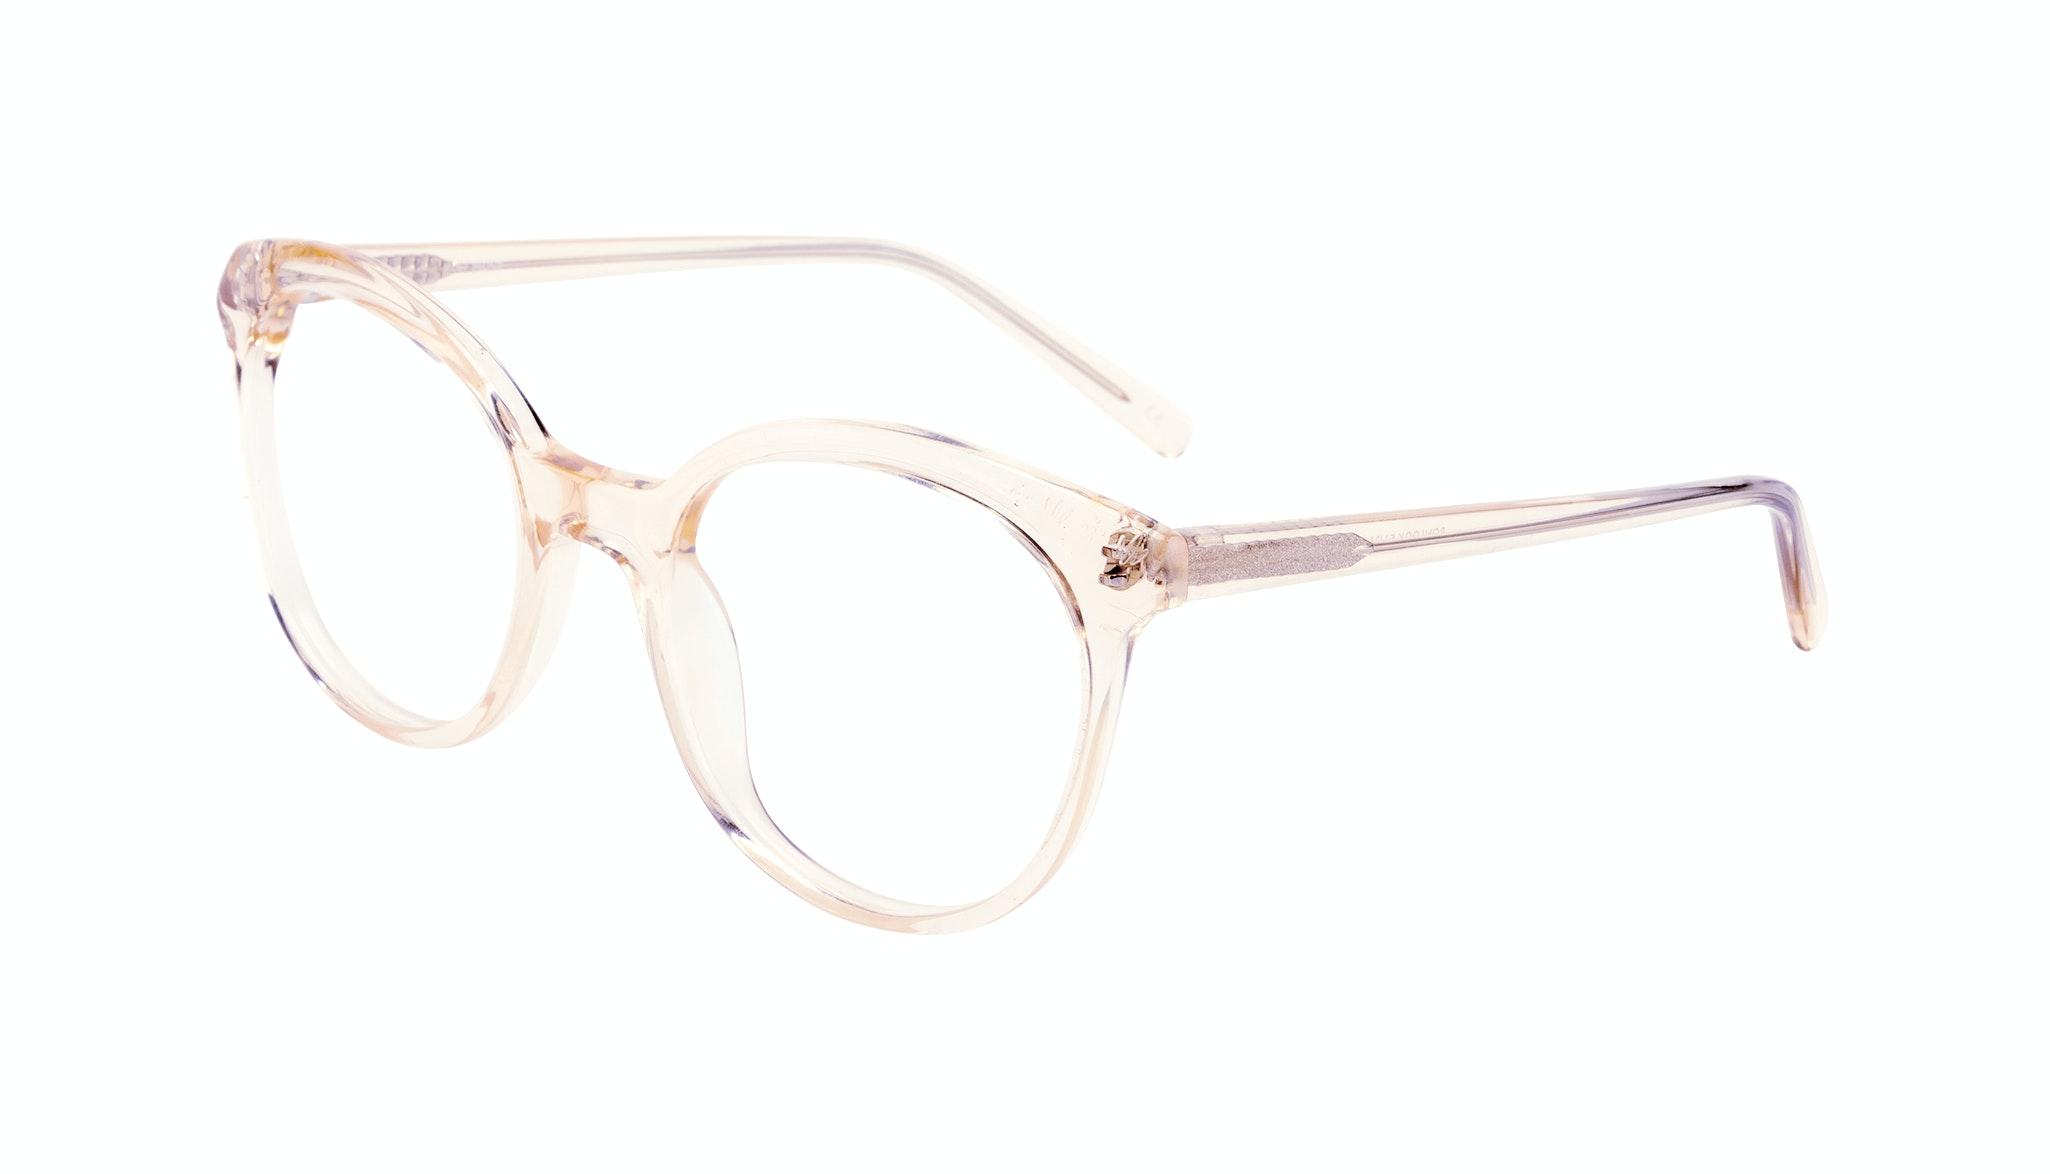 Affordable Fashion Glasses Round Eyeglasses Women Must Blond Tilt